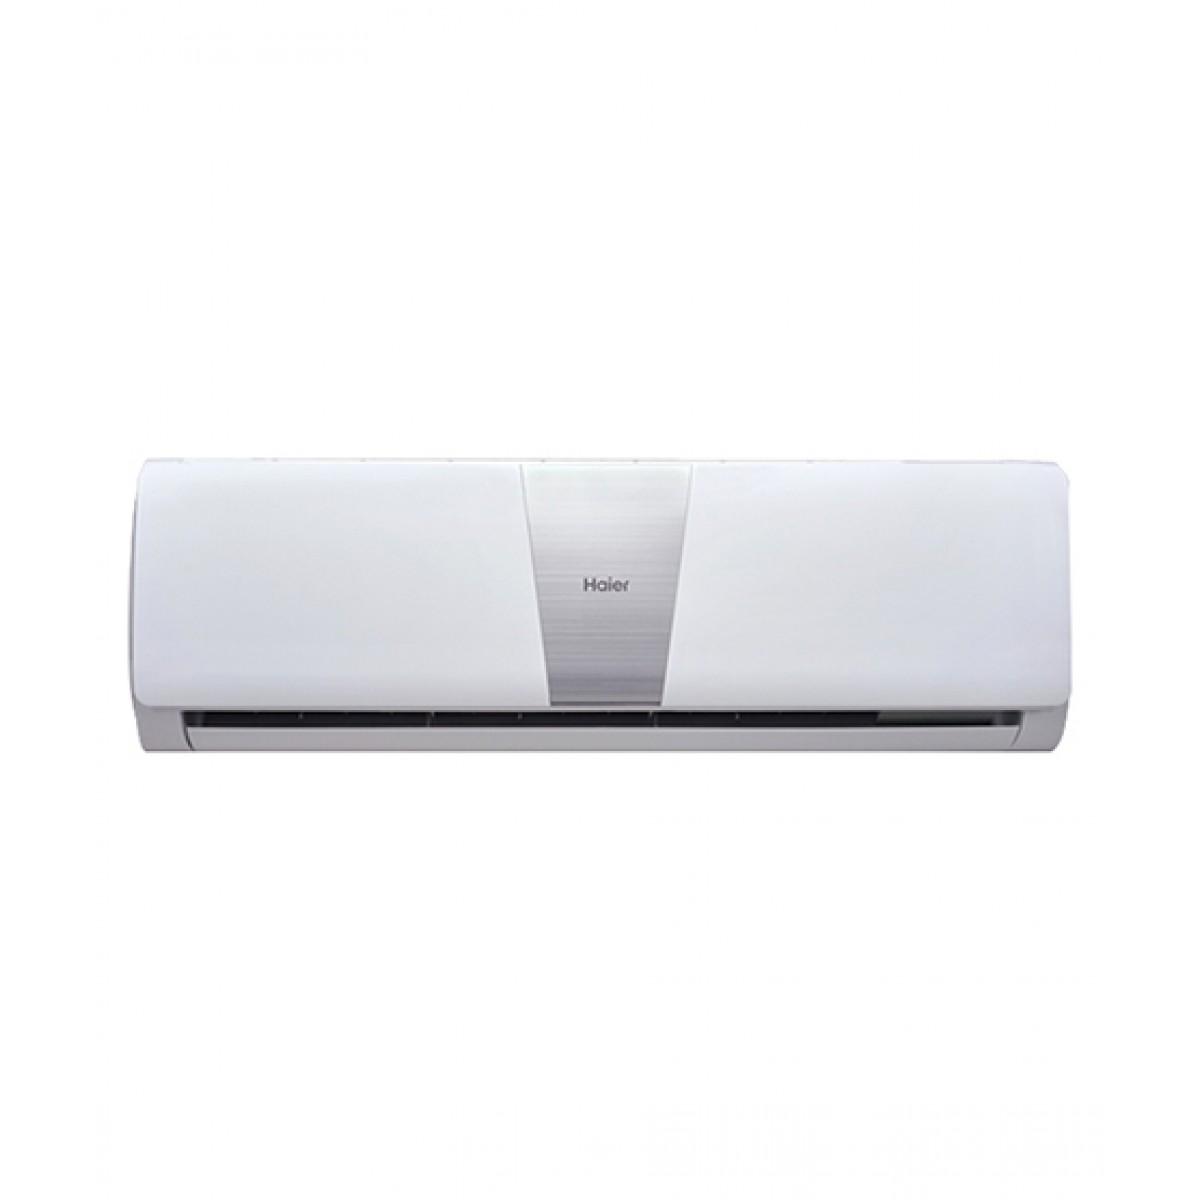 Haier T-Series Split Air Conditioner 1.5 Ton (HSU-18LTG)